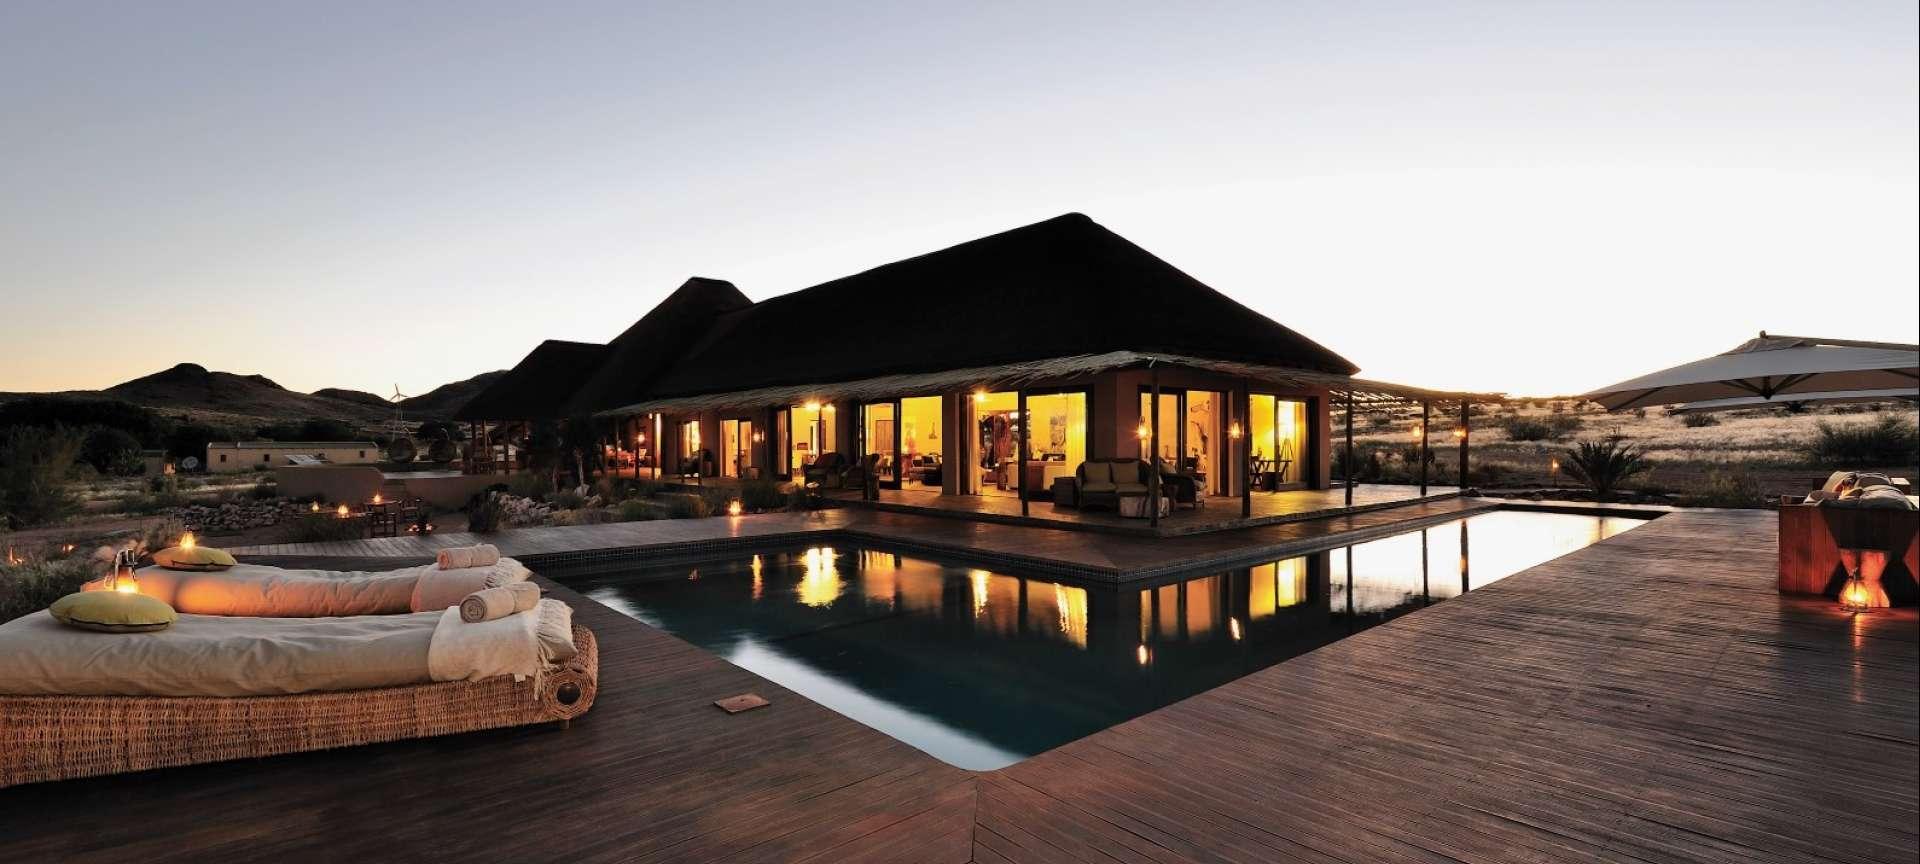 Sandfontein Accommodation